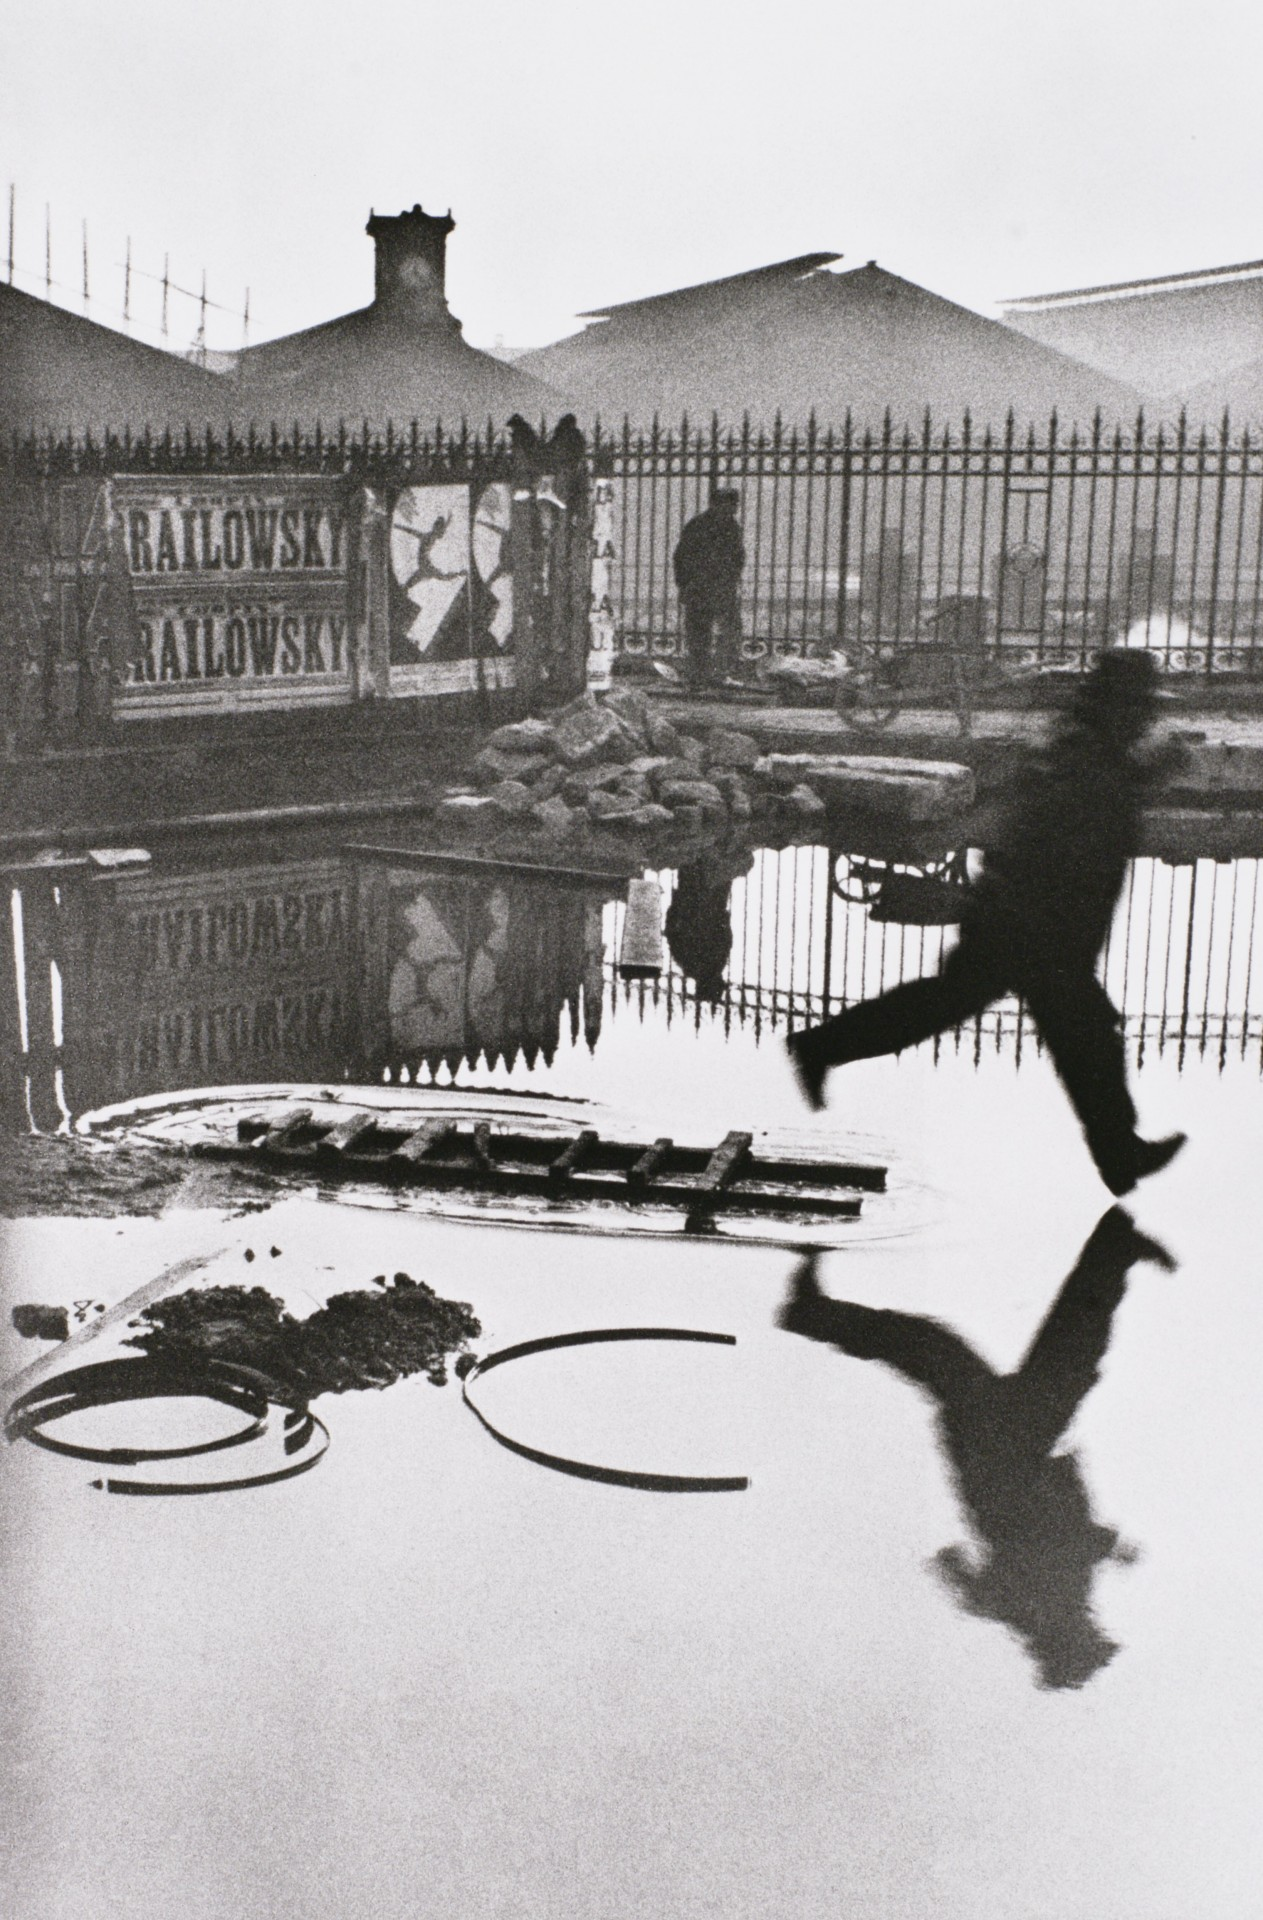 За вокзалом Сен-Лазар, Париж, 1932. Фотограф Анри Картье-Брессон